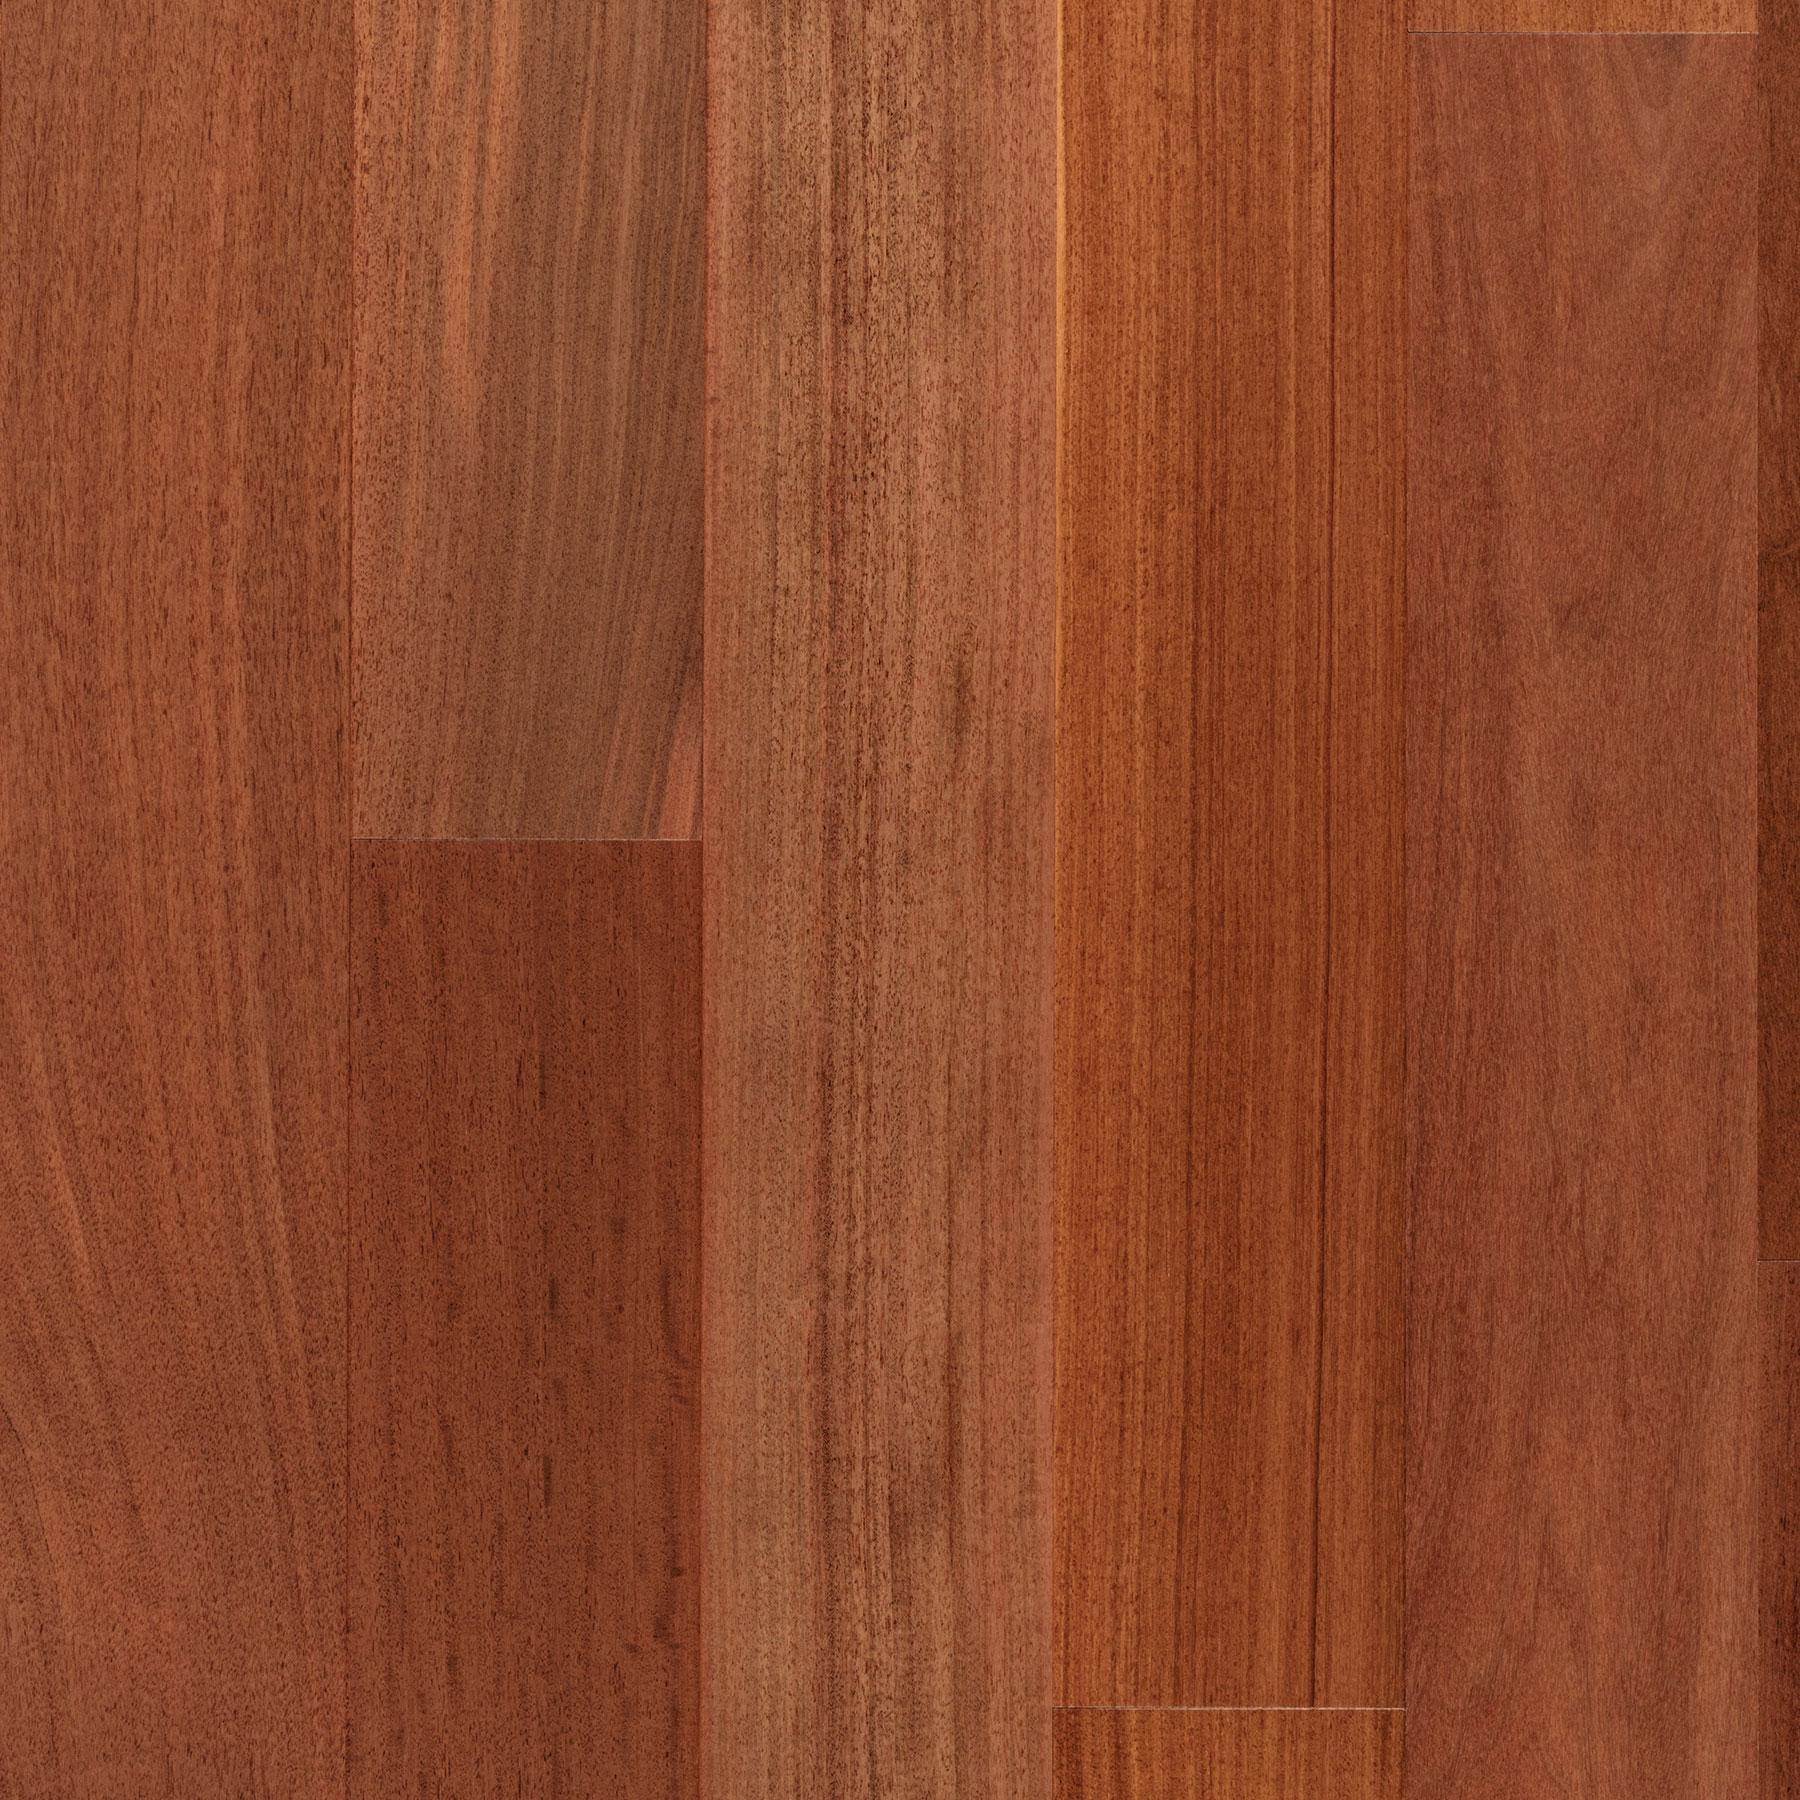 flooring in laminate mahogany home floors samples p wide take pid length sample color x